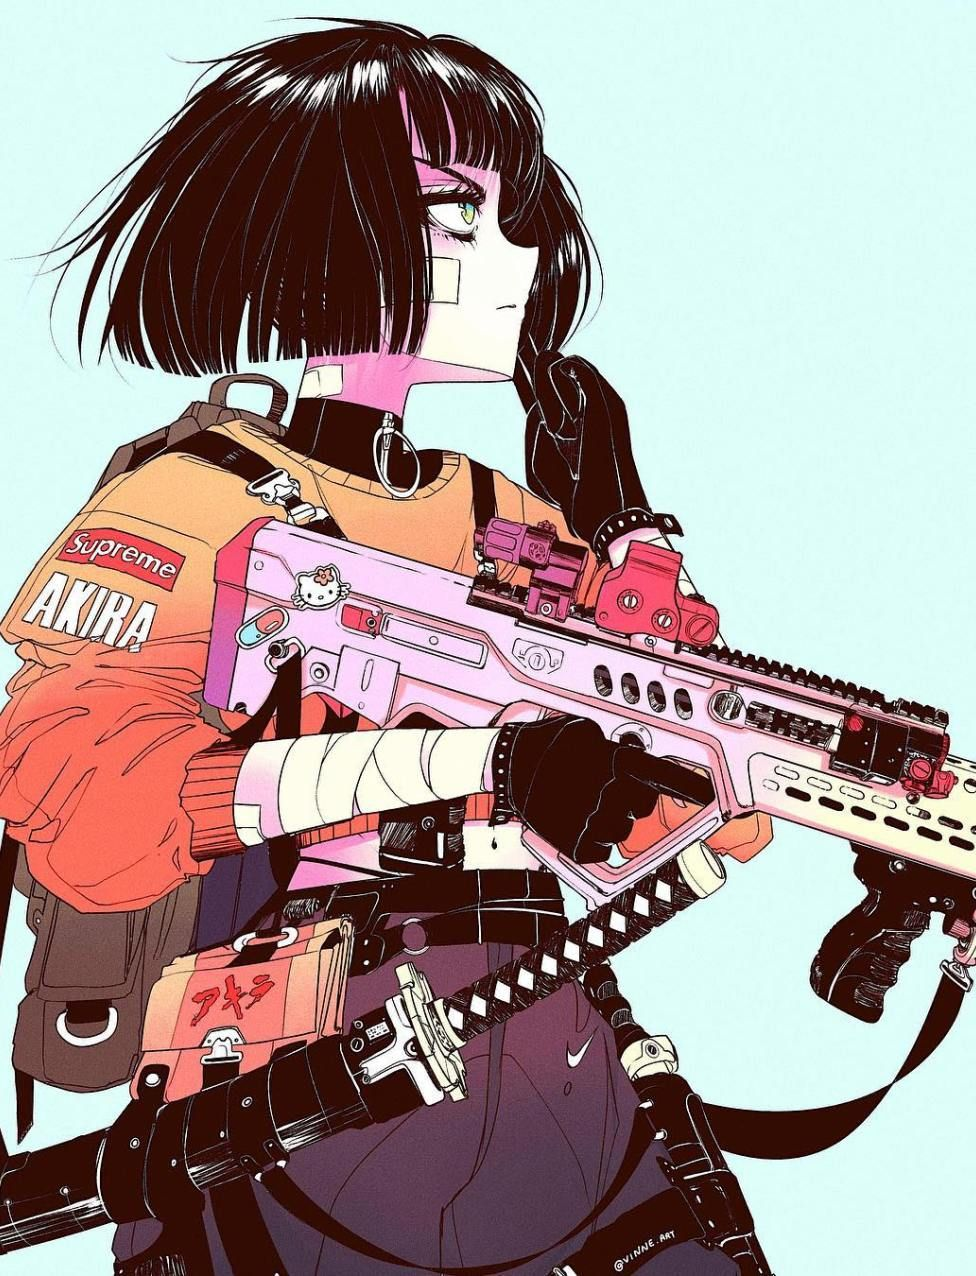 Cyberpunk Wonderland, a look at Vinne Myartmagazine in